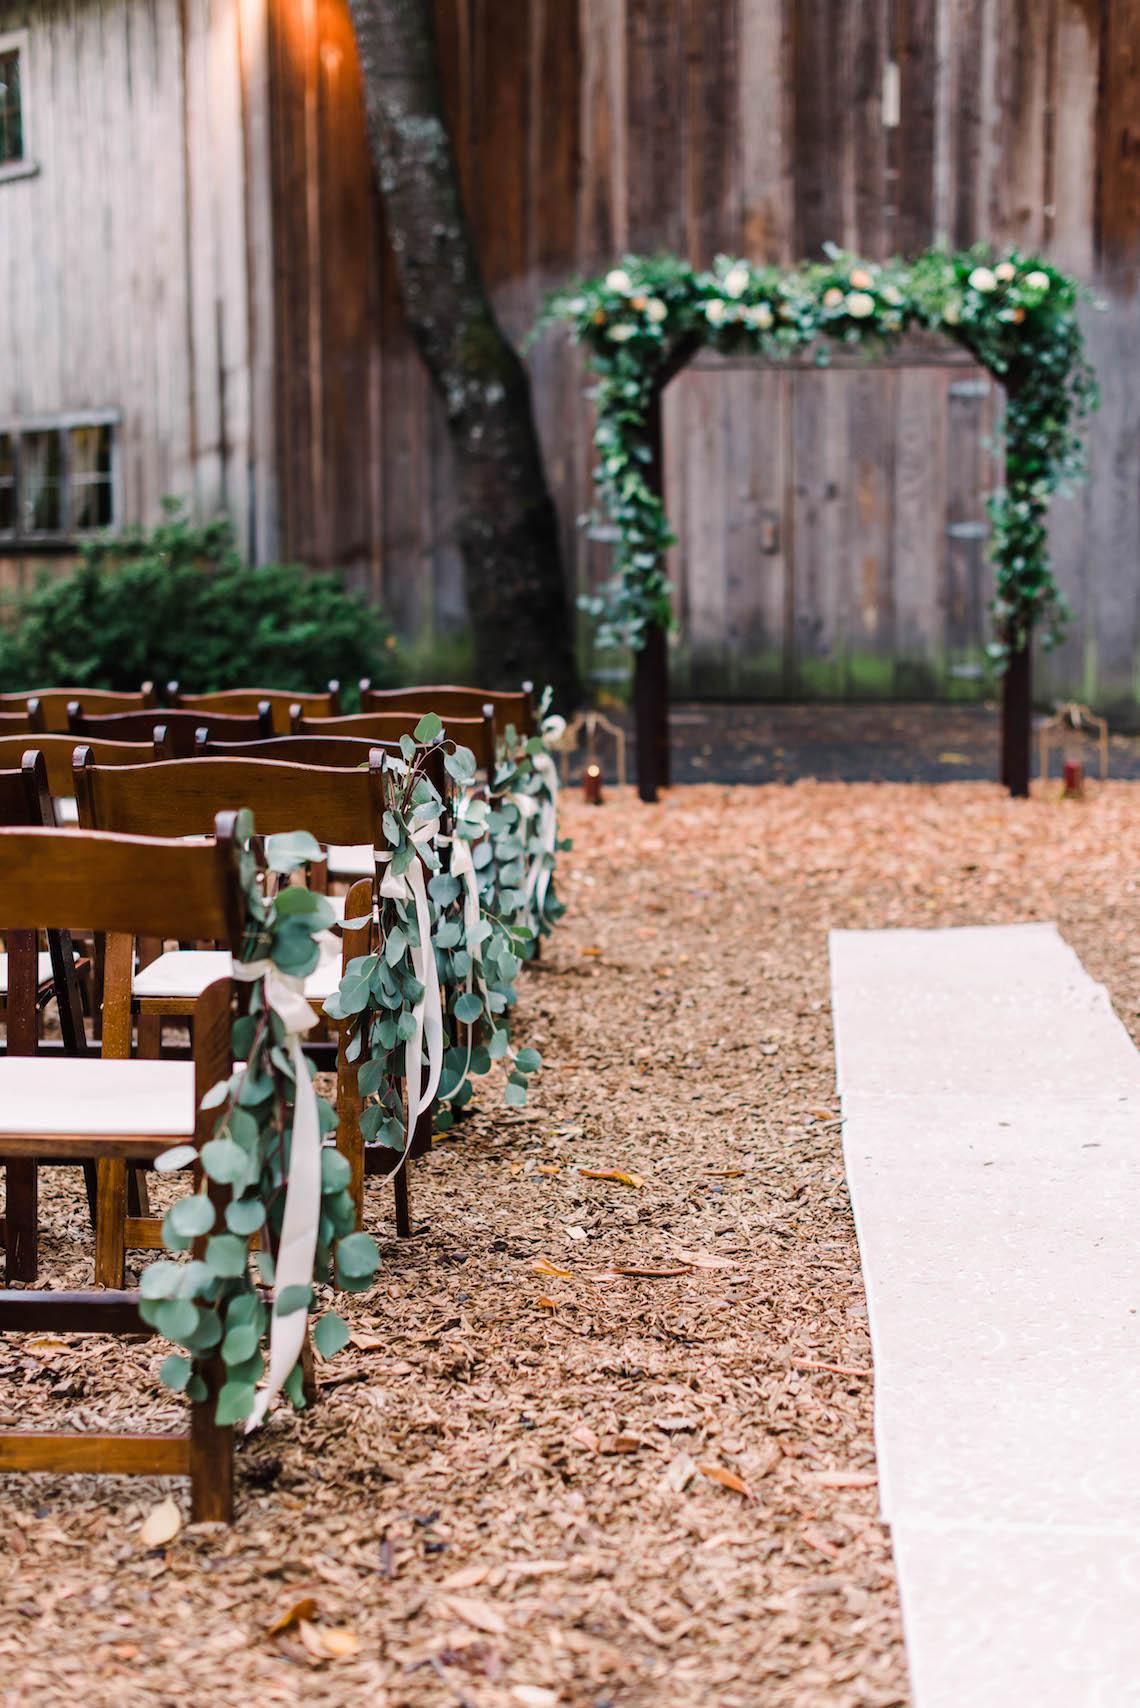 Rustic Barn Wedding Filled With Greenery | Deyla Huss Photography 23